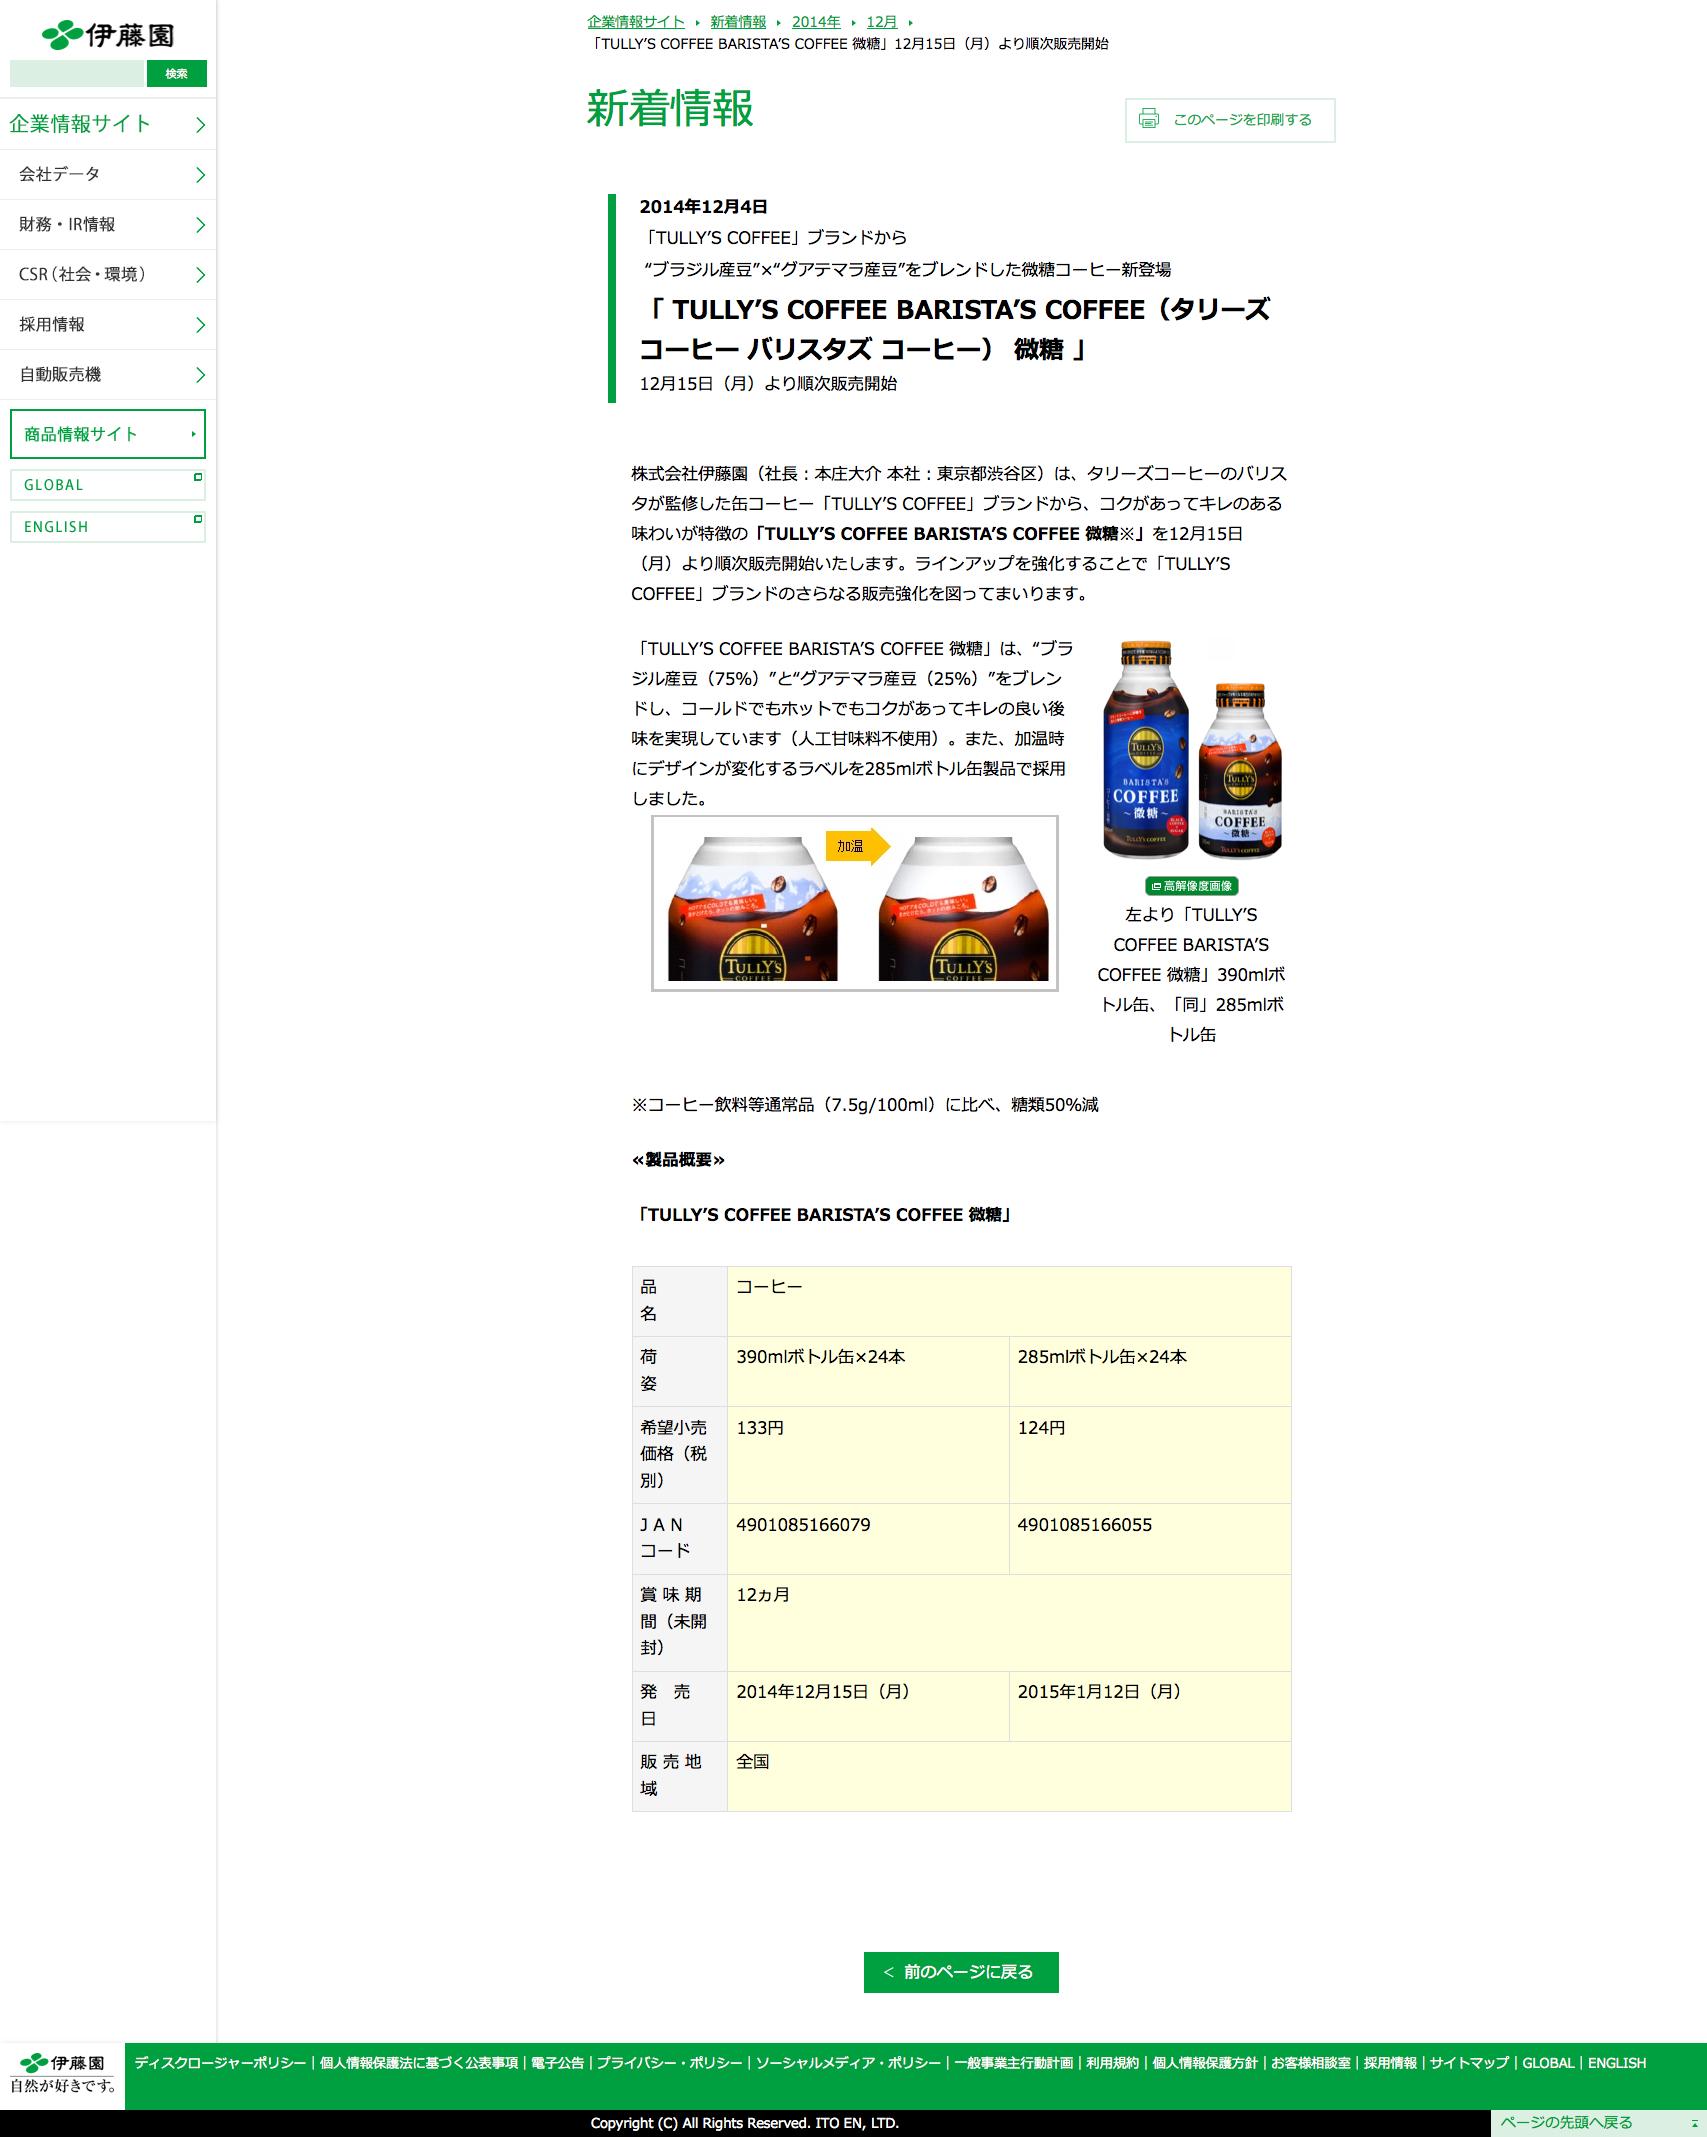 「TULLY'S COFFEE BARISTA'S COFFEE 微糖」12月15日(月)より順次販売開始  新着情報  伊藤園